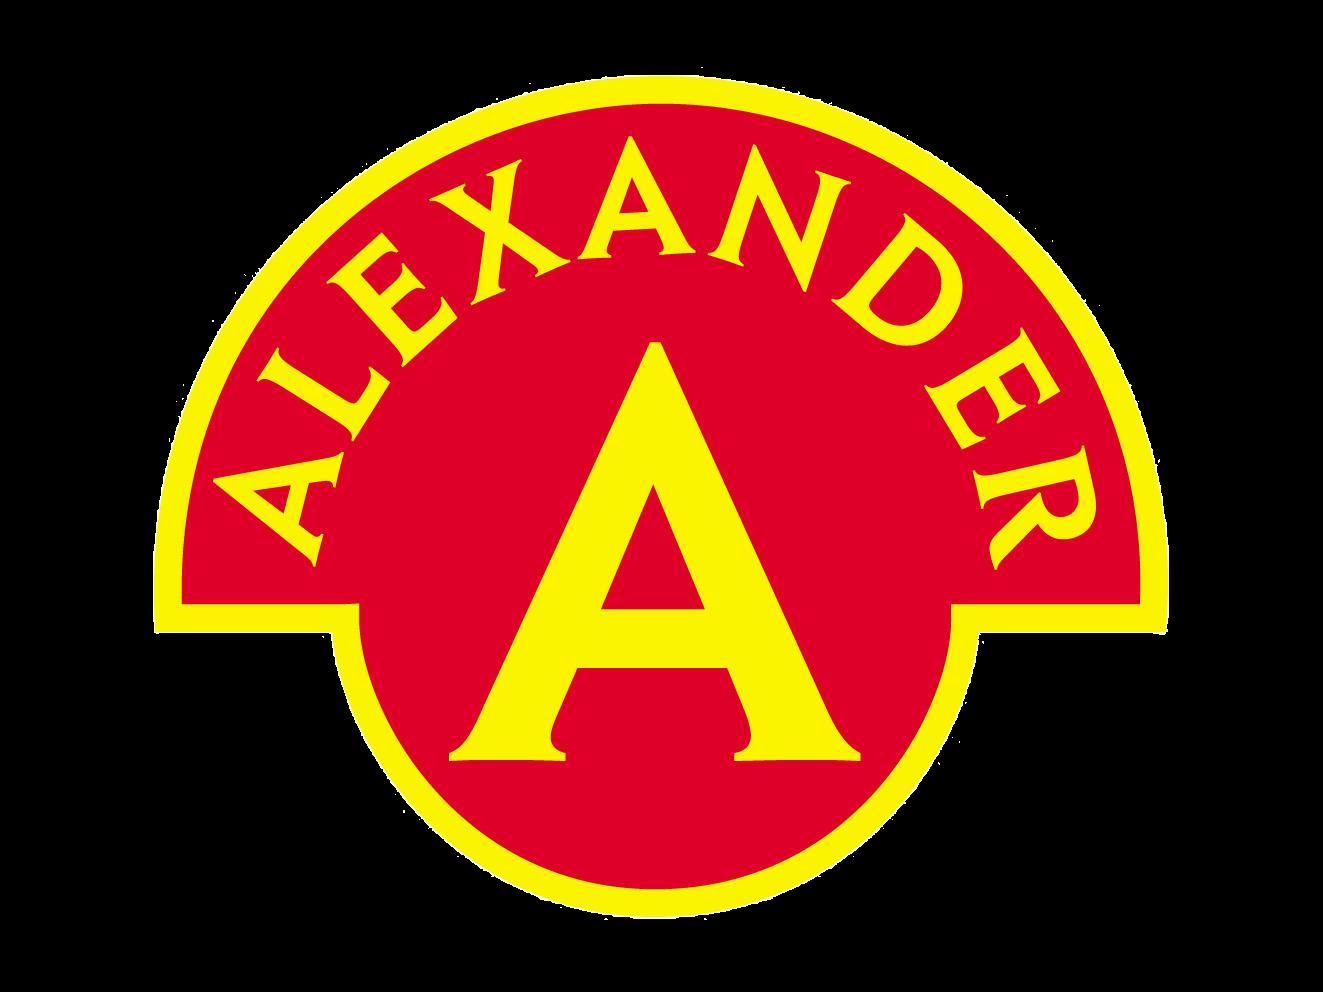 alexandersmall